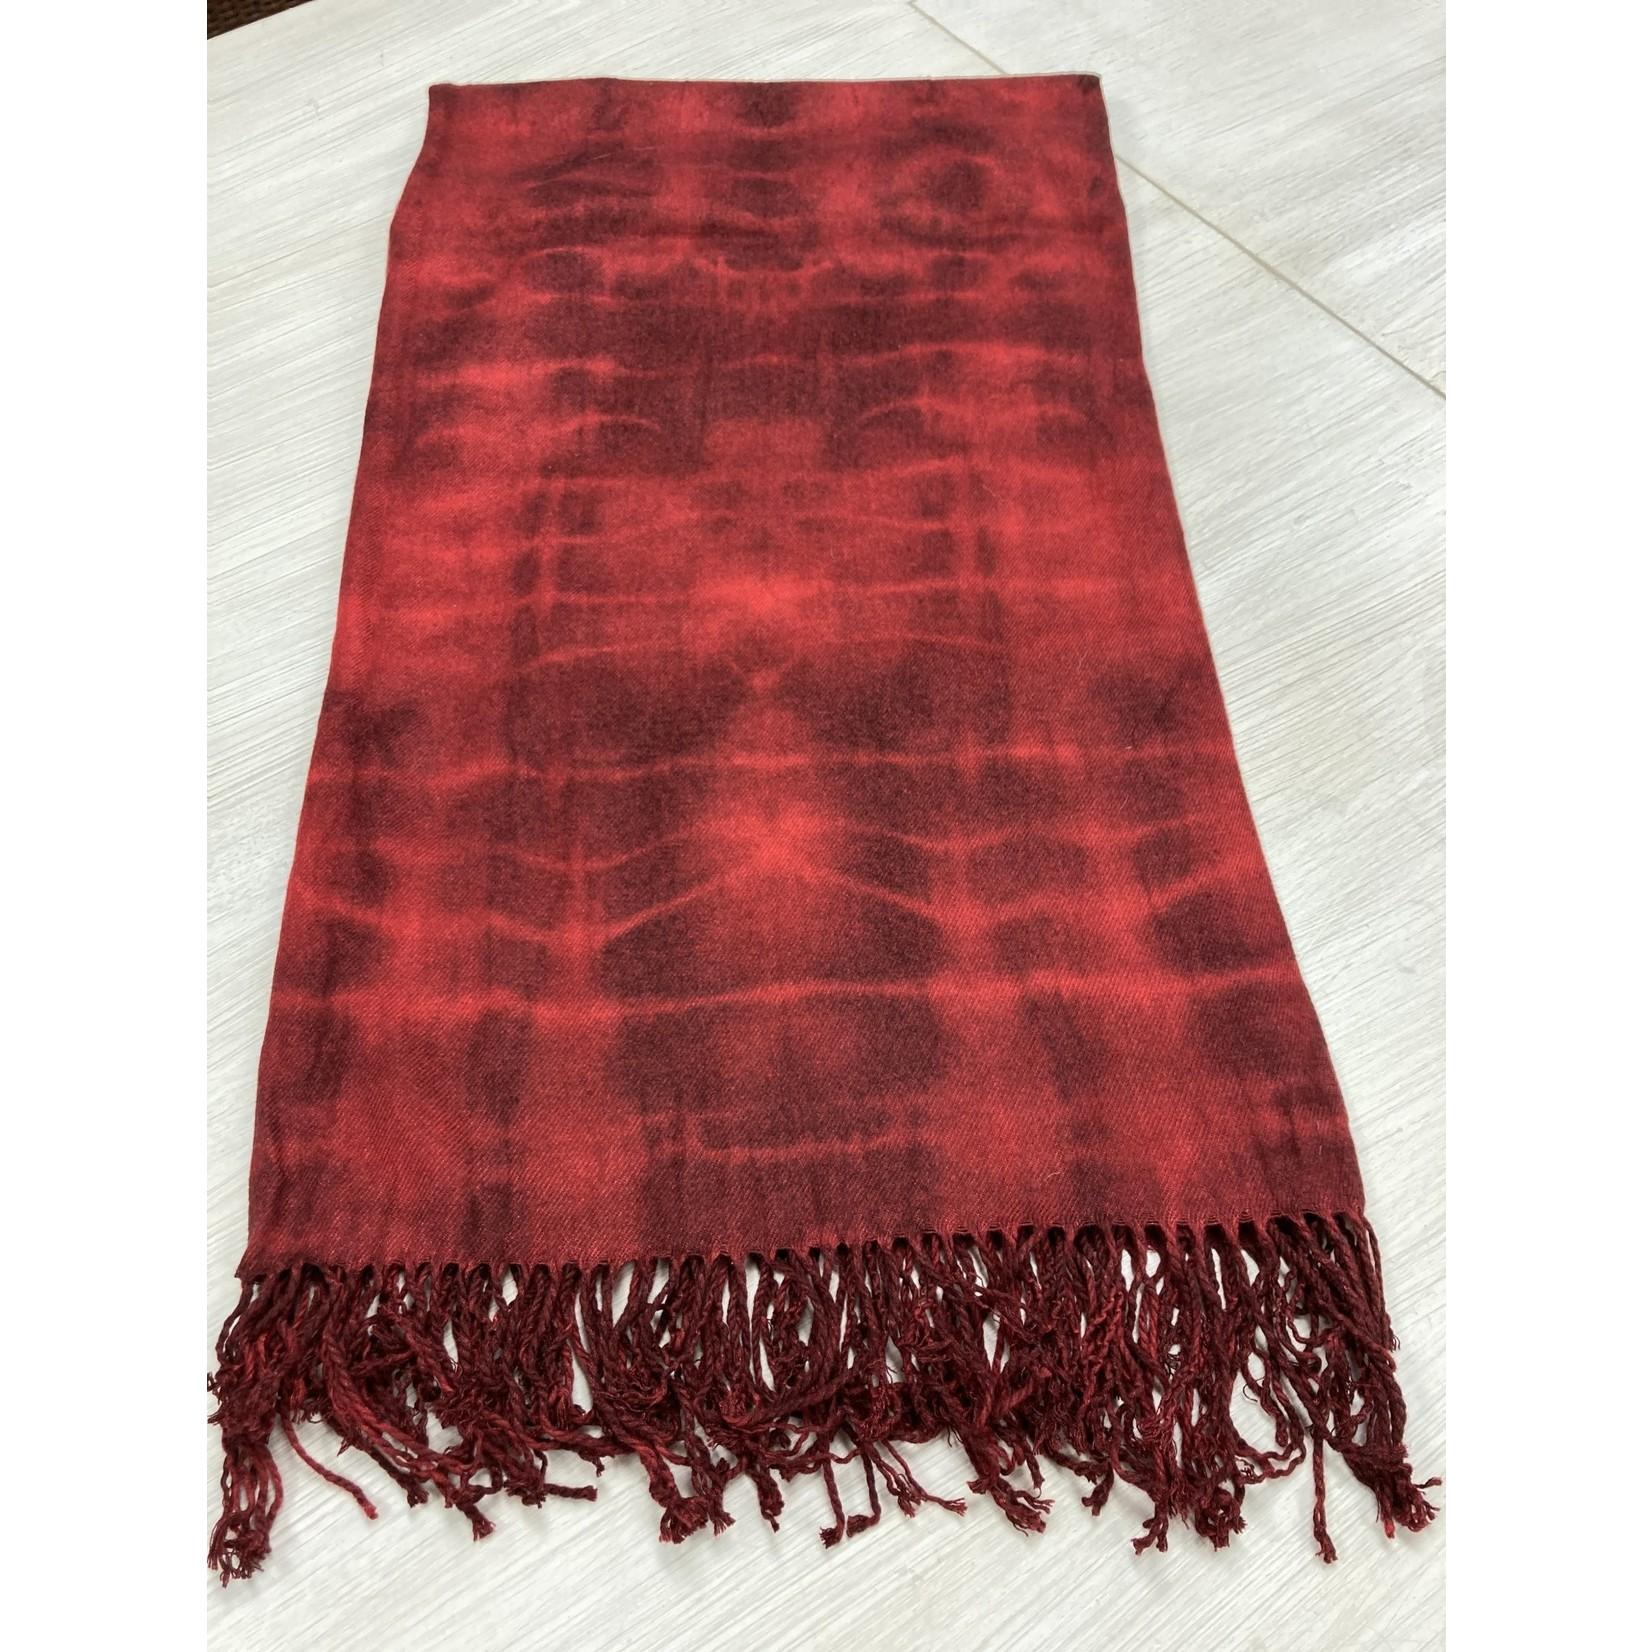 Allie Bonidy Allie B| Red Tie Dye Scarf